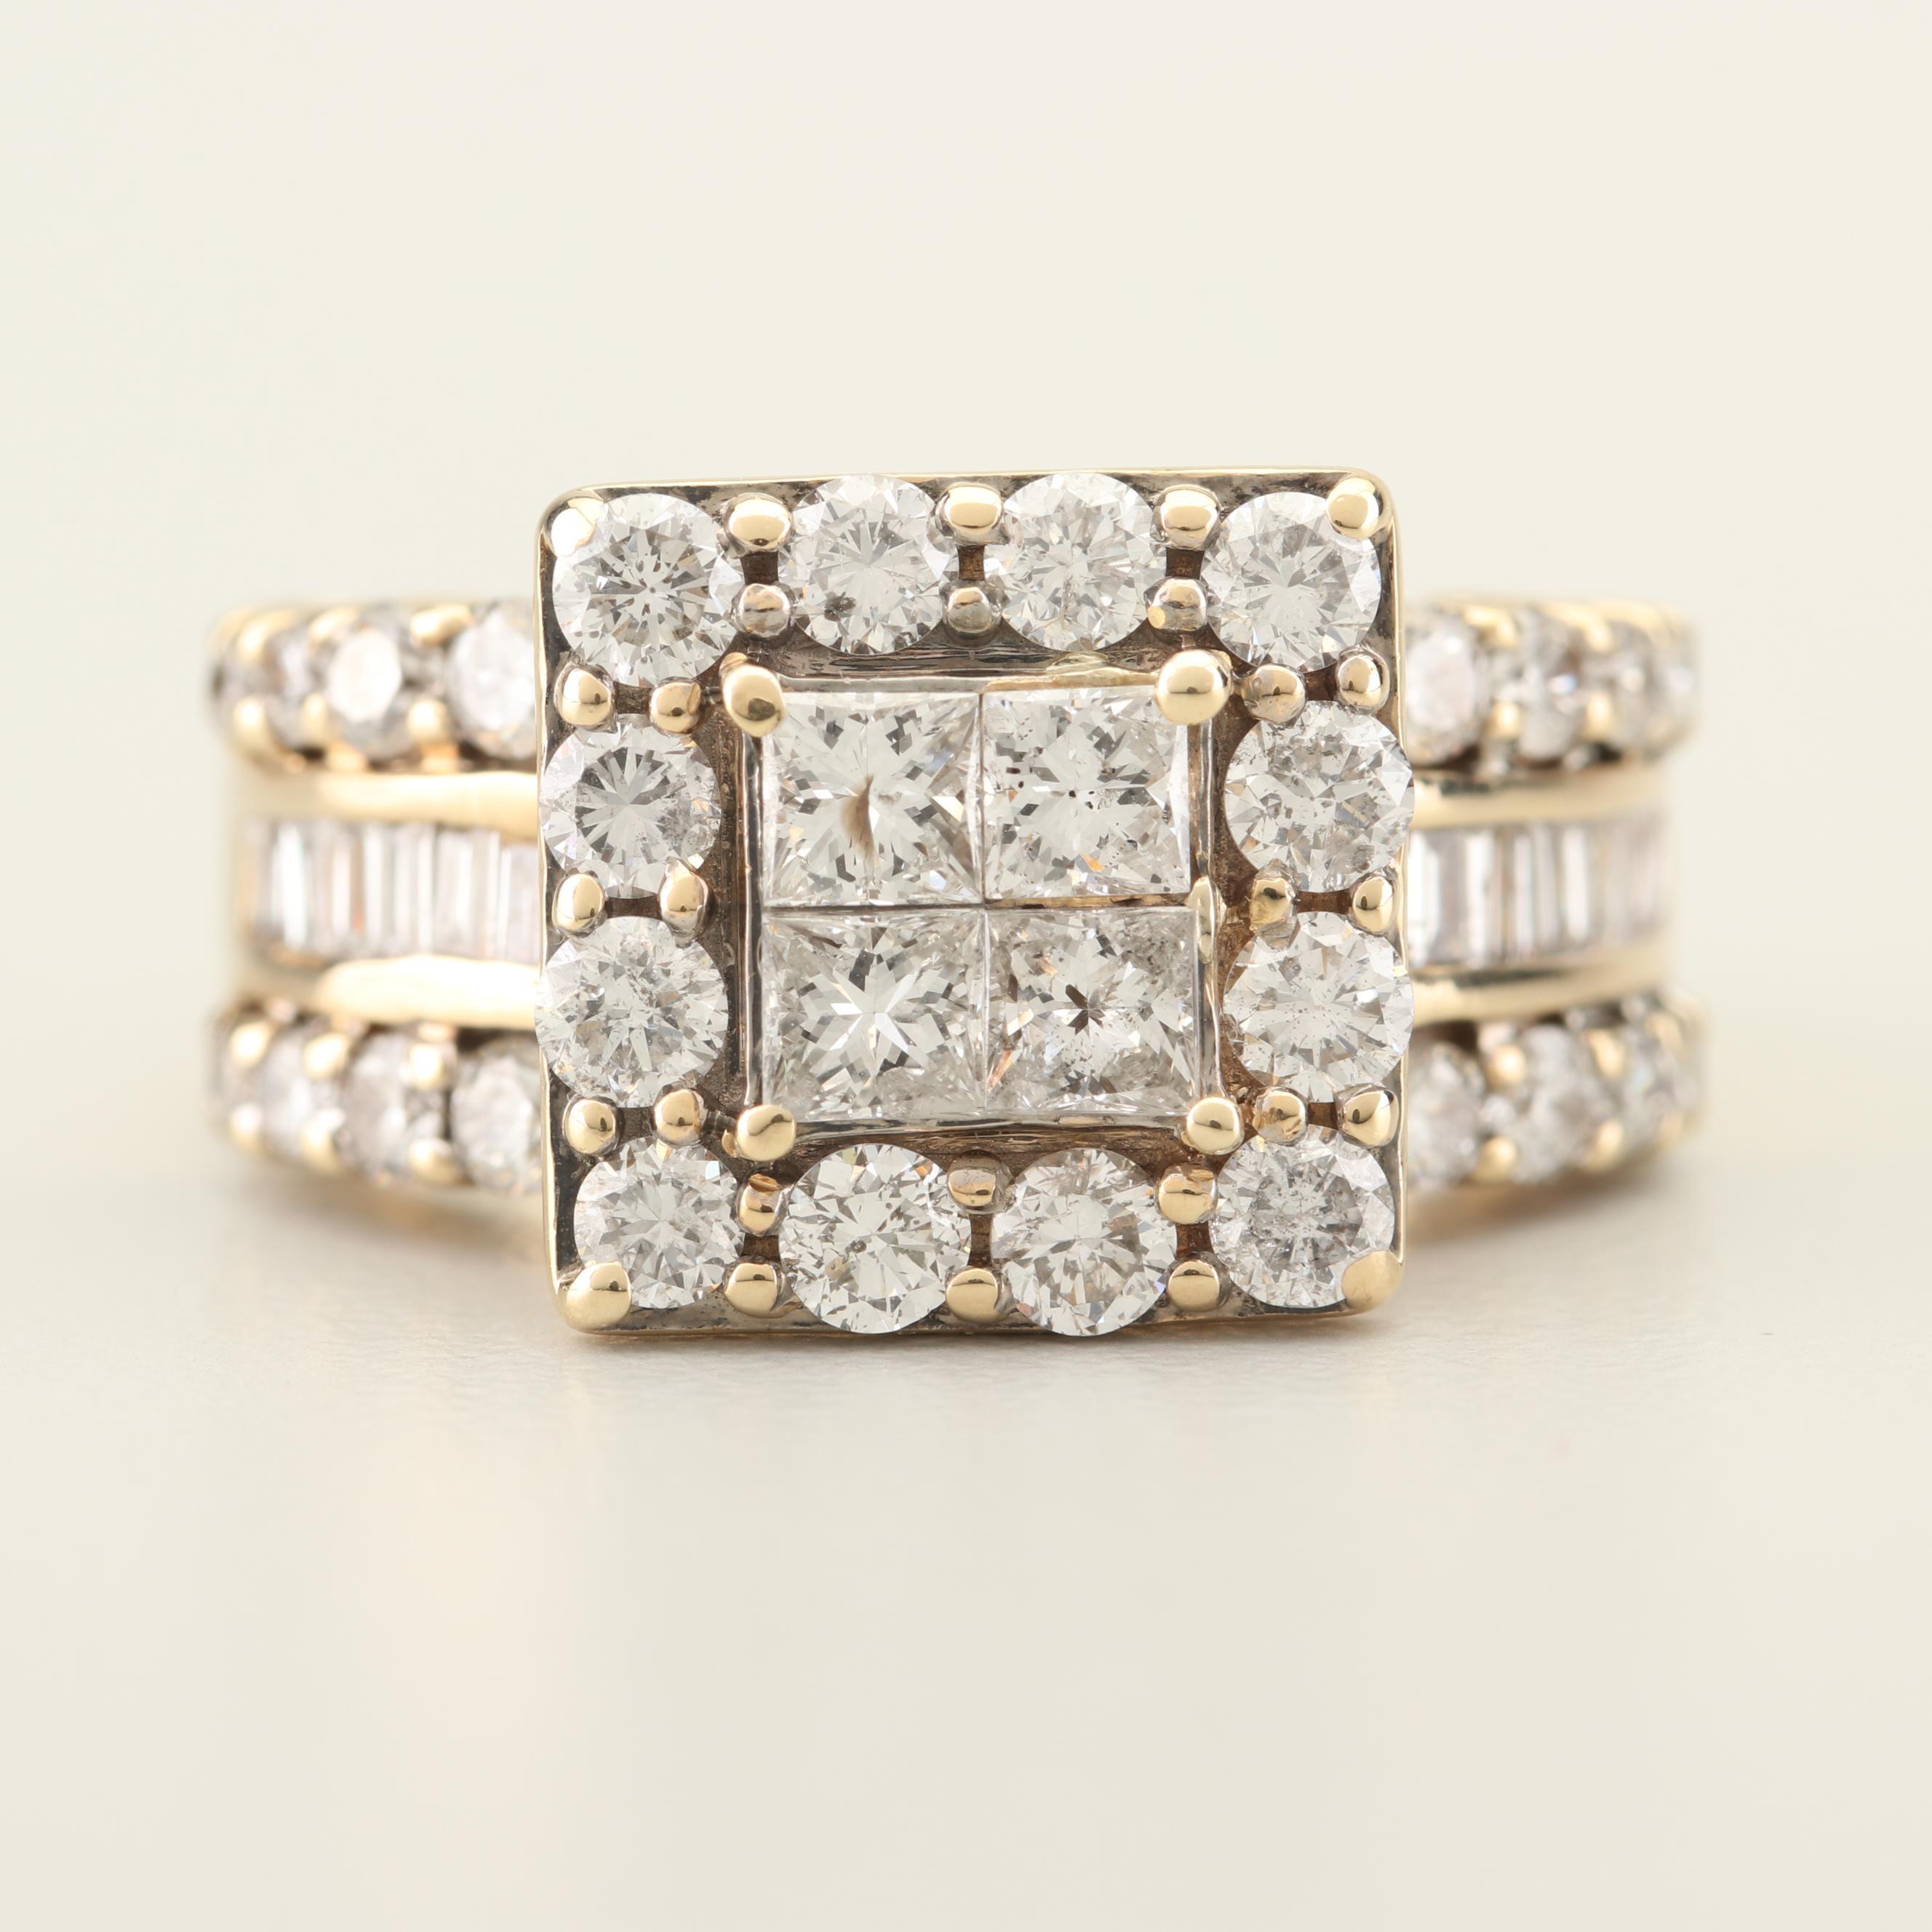 14K Yellow Gold 2.42 CTW Diamond Ring